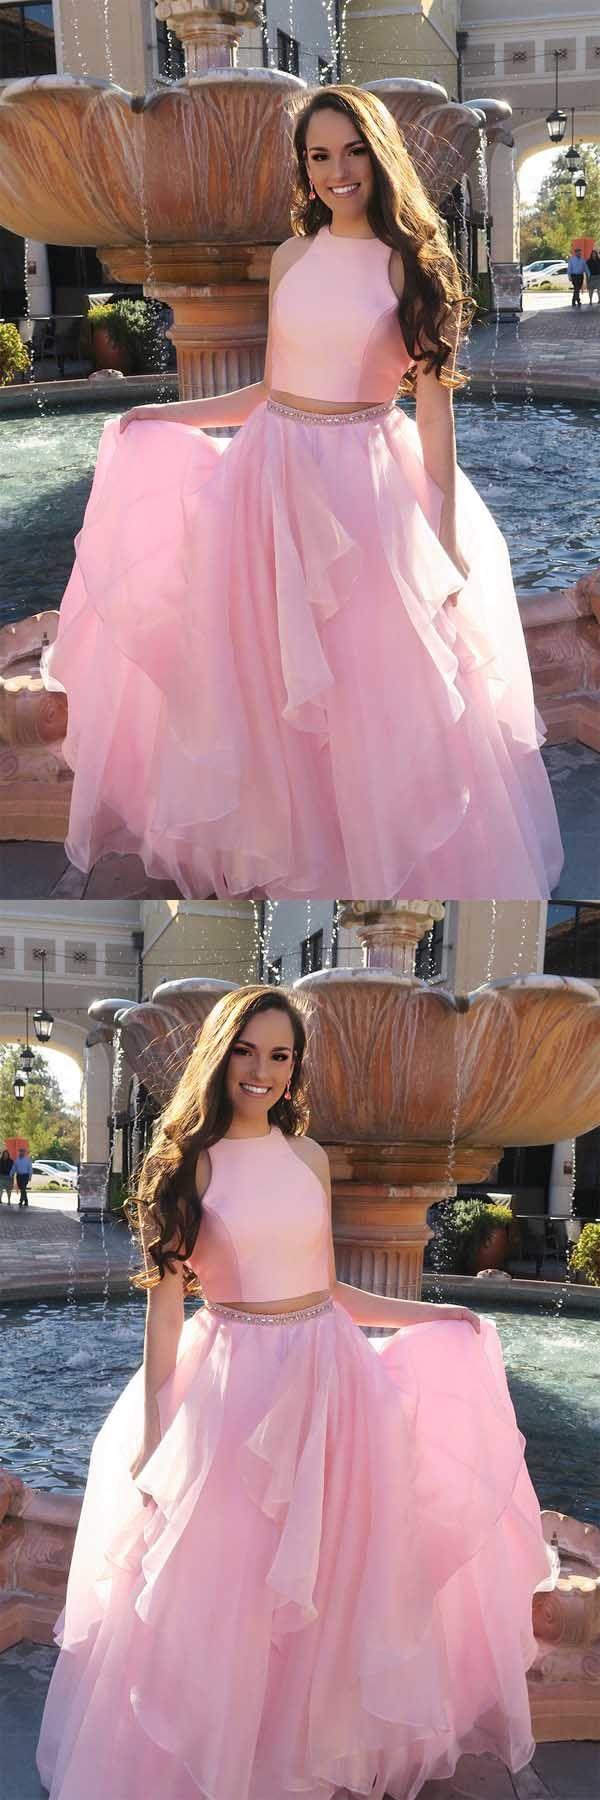 Princess Two Piece Pink Long Prom Dress with Open Back PG540 #promdress #eveningdress #2018promdress #tulledress #twopiece #pgmdress #pinkdress #partydress